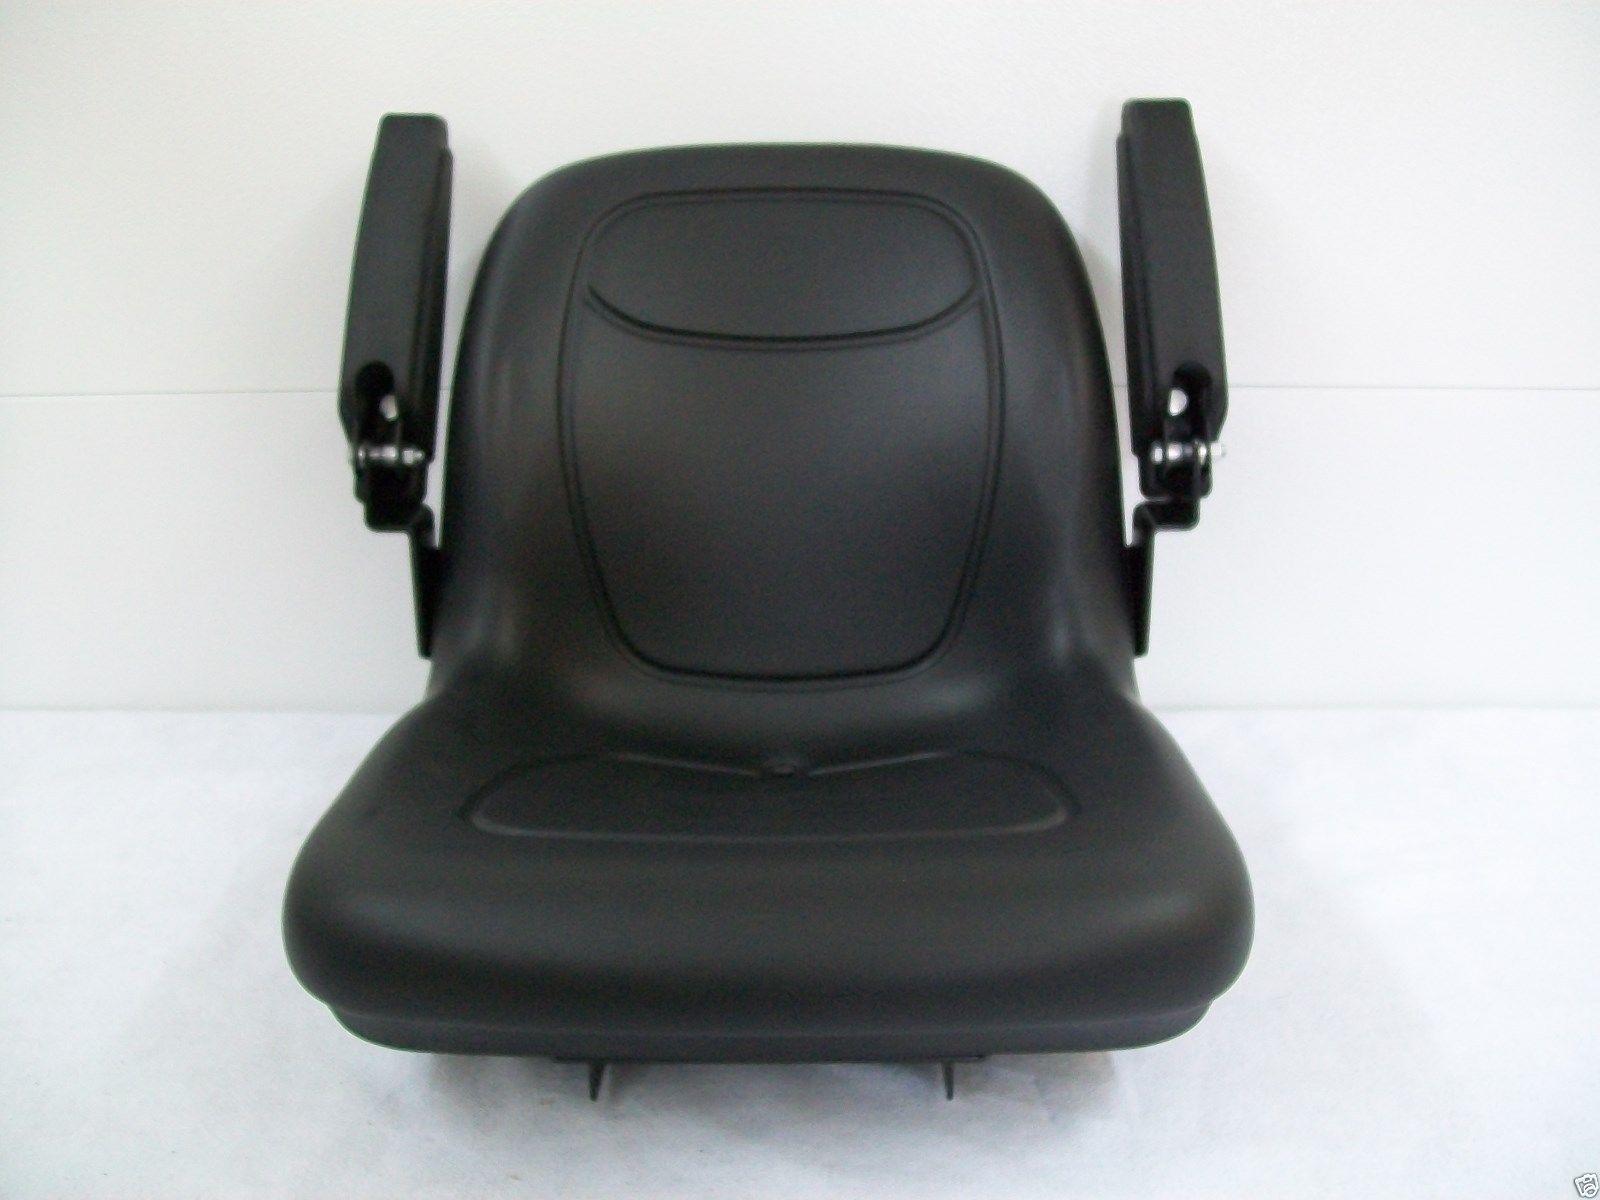 John Deere 950 Tractor Seat : High back black seat fits  john